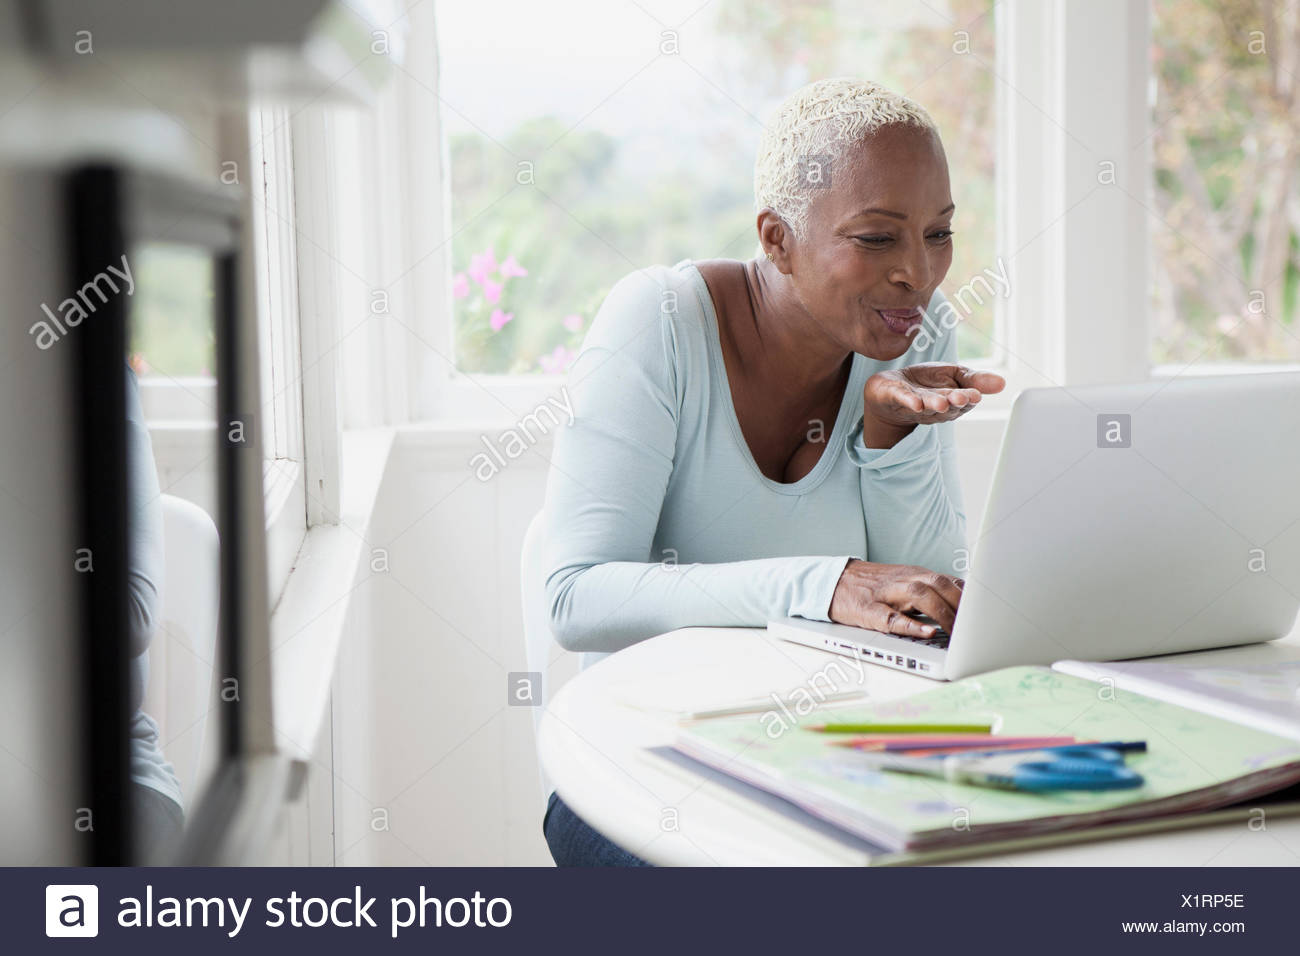 mittlere gealterte Frau bläst Küsse während Online-chat Stockbild